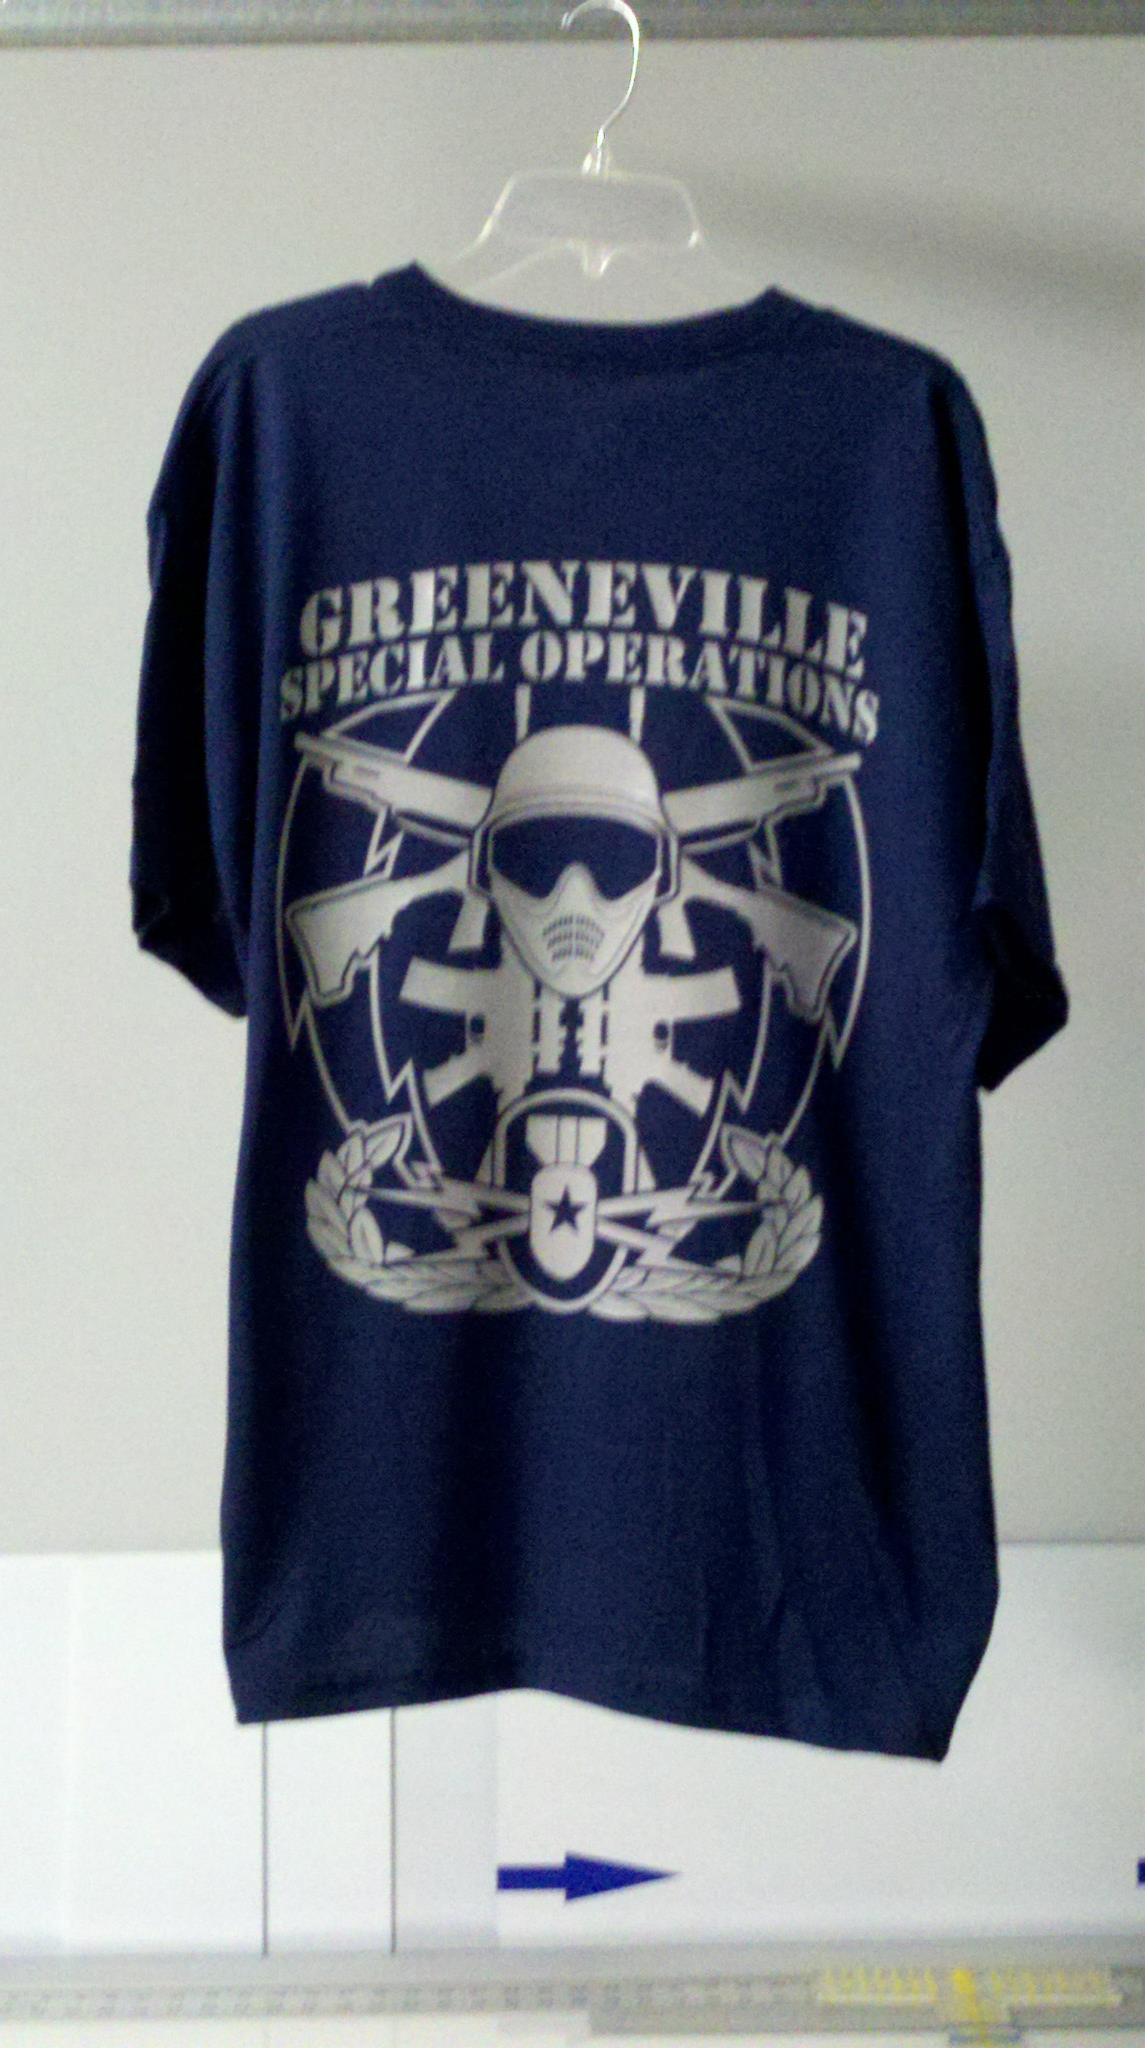 Greeneville S.W.A.T. Team